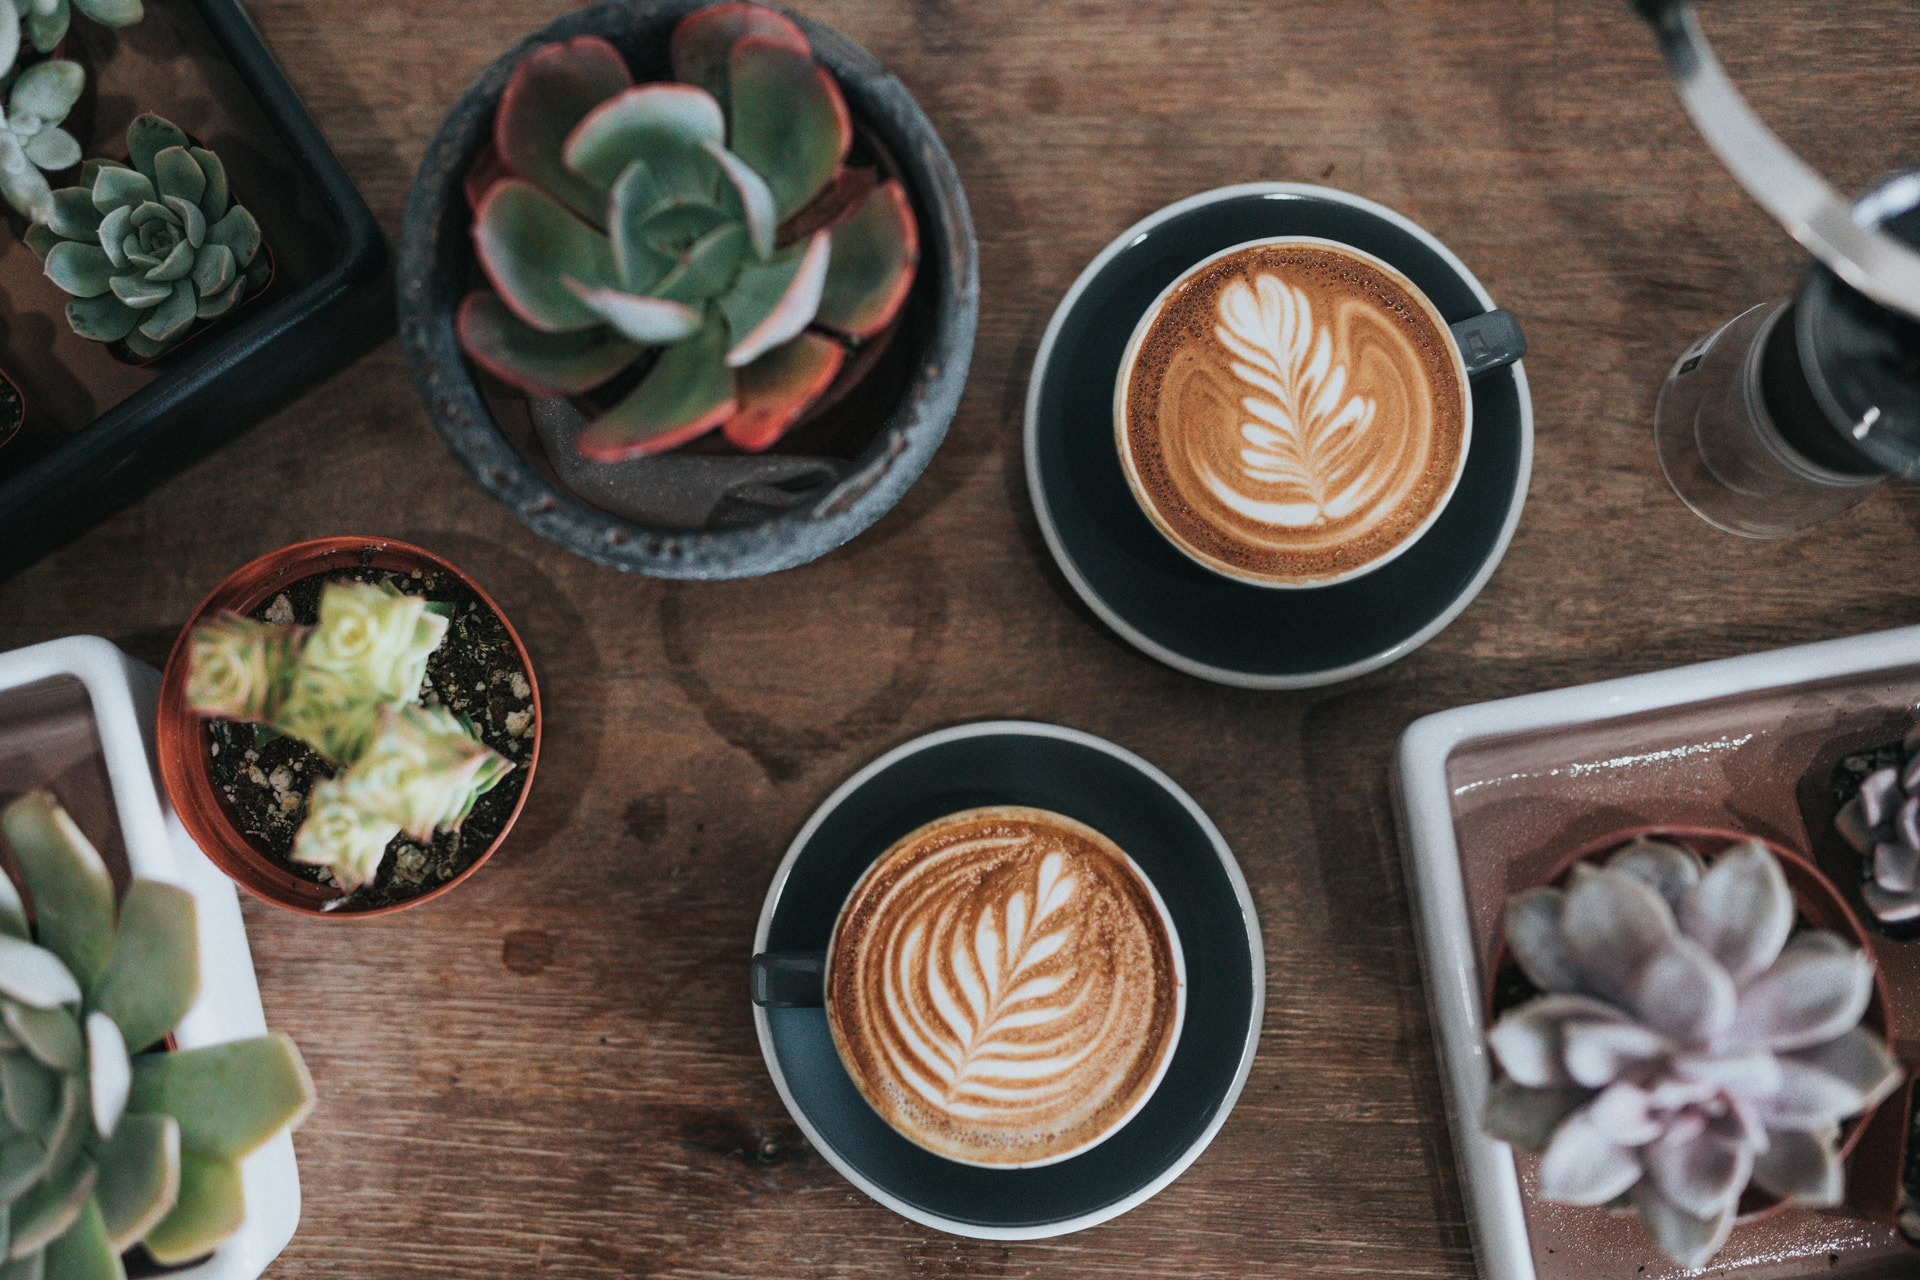 Coffee Shops image